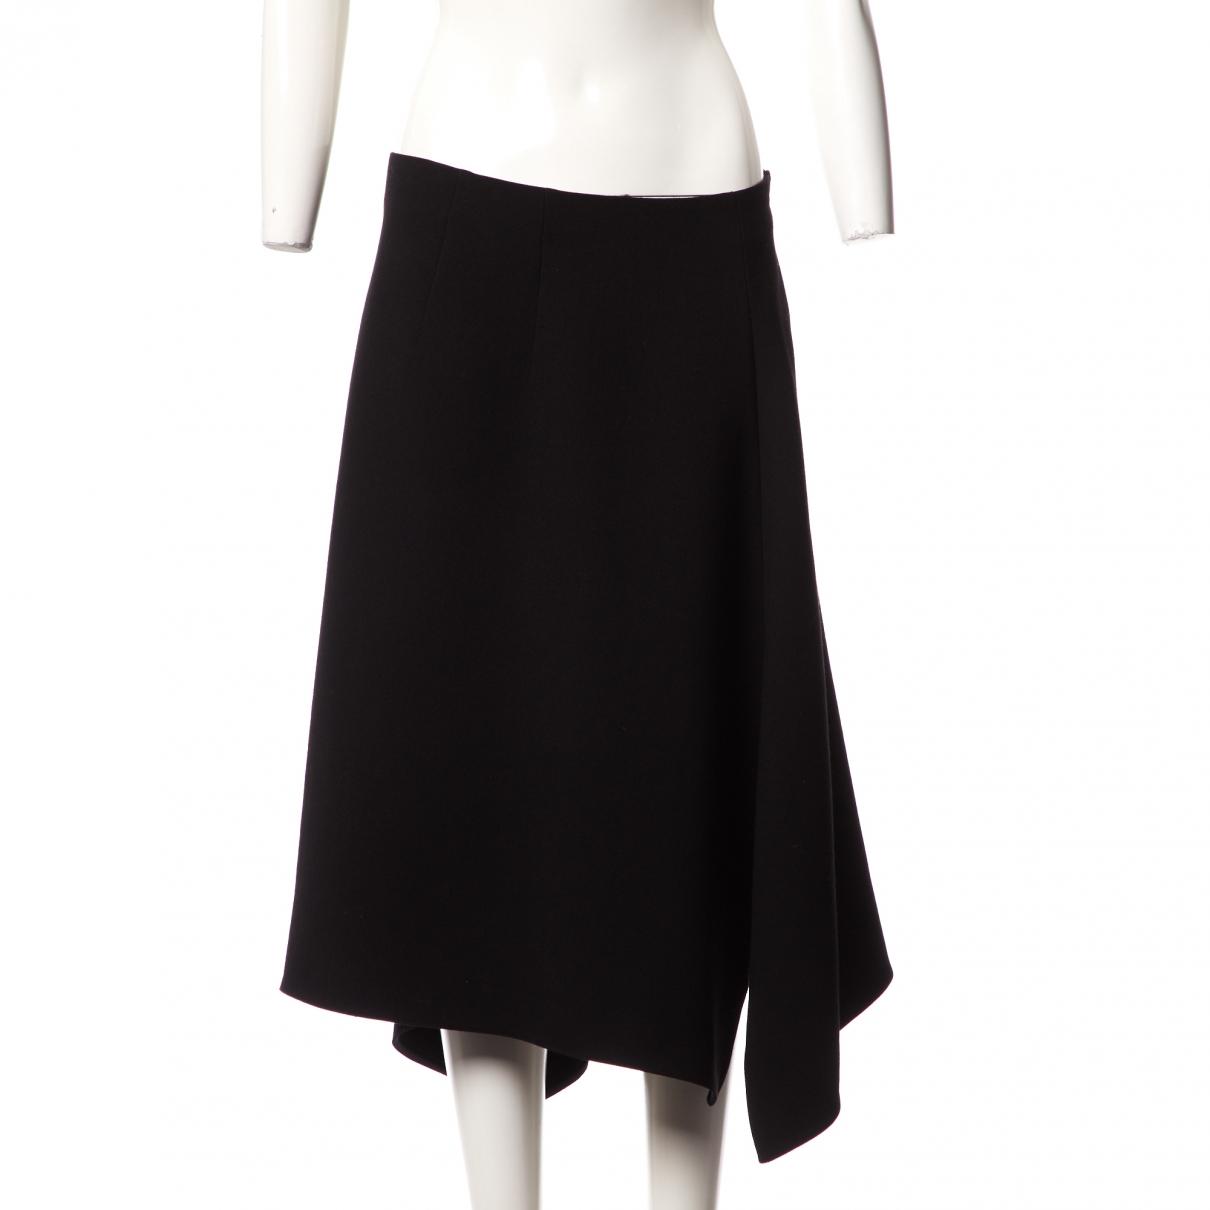 Marni \N Black Wool skirt for Women 42 IT